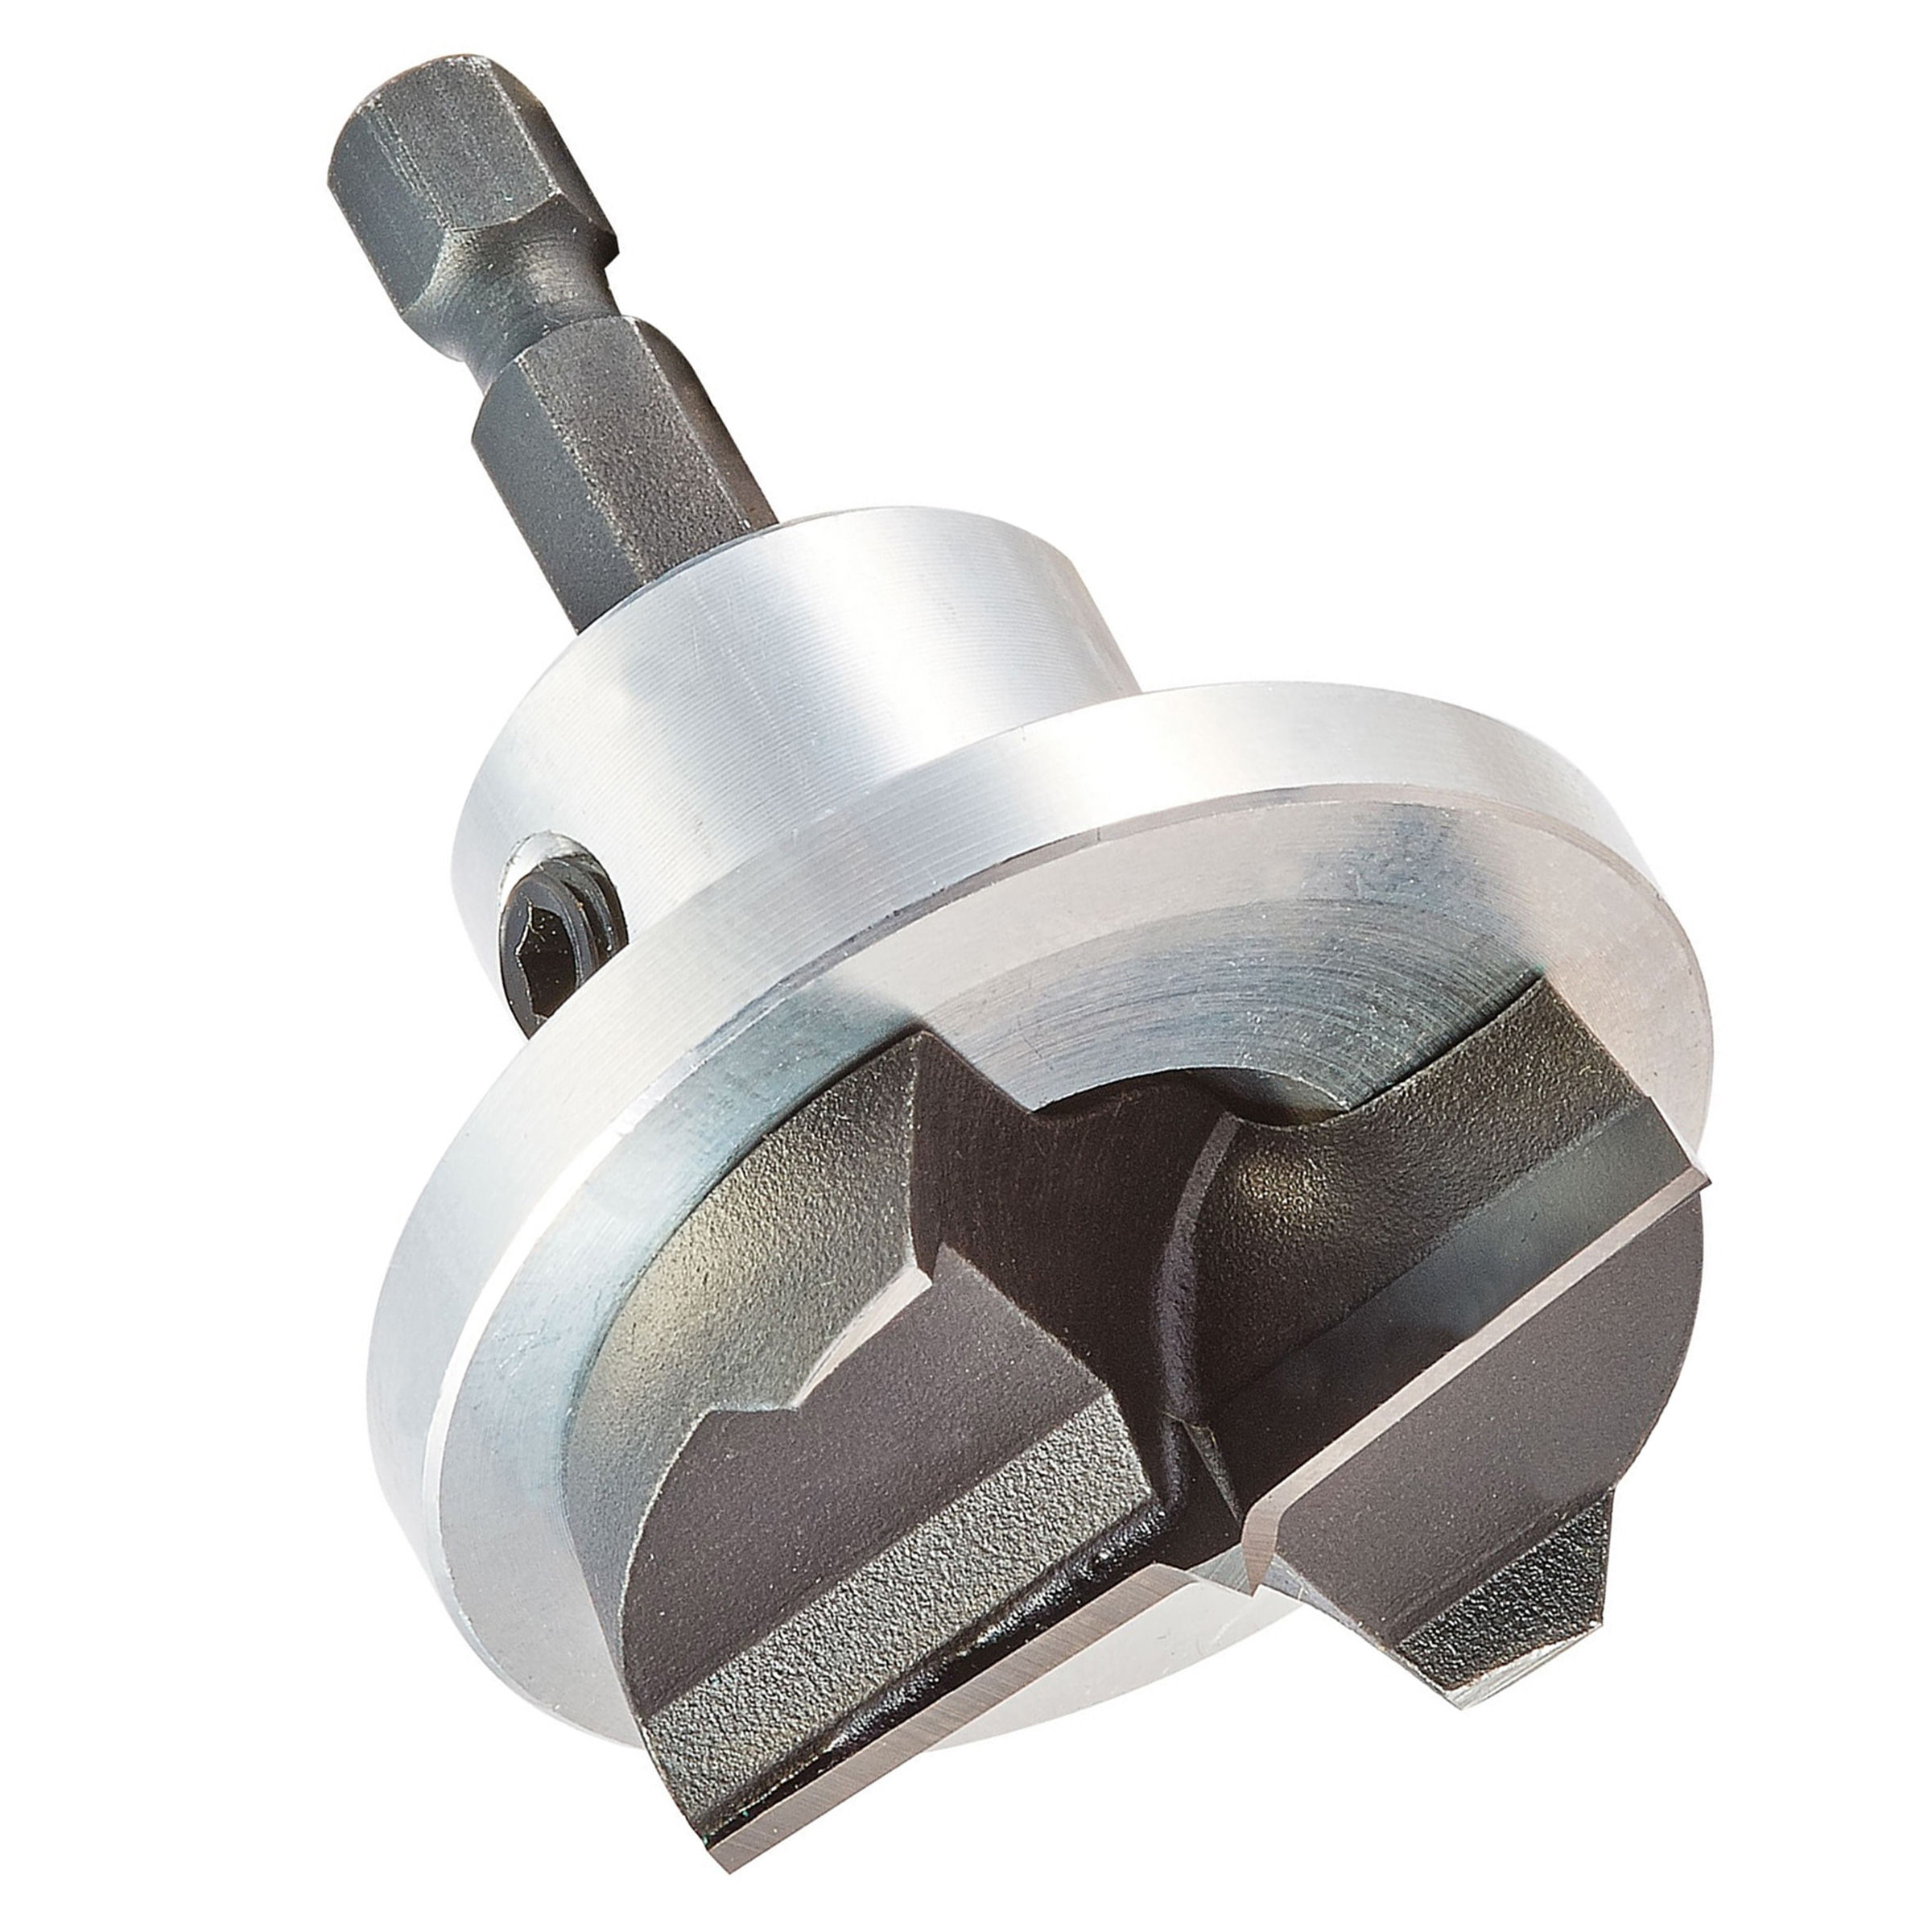 35mm SDS TCT Core Drill Bit Concrete Masonary Hole Cutter Drills Pilot Drill UK